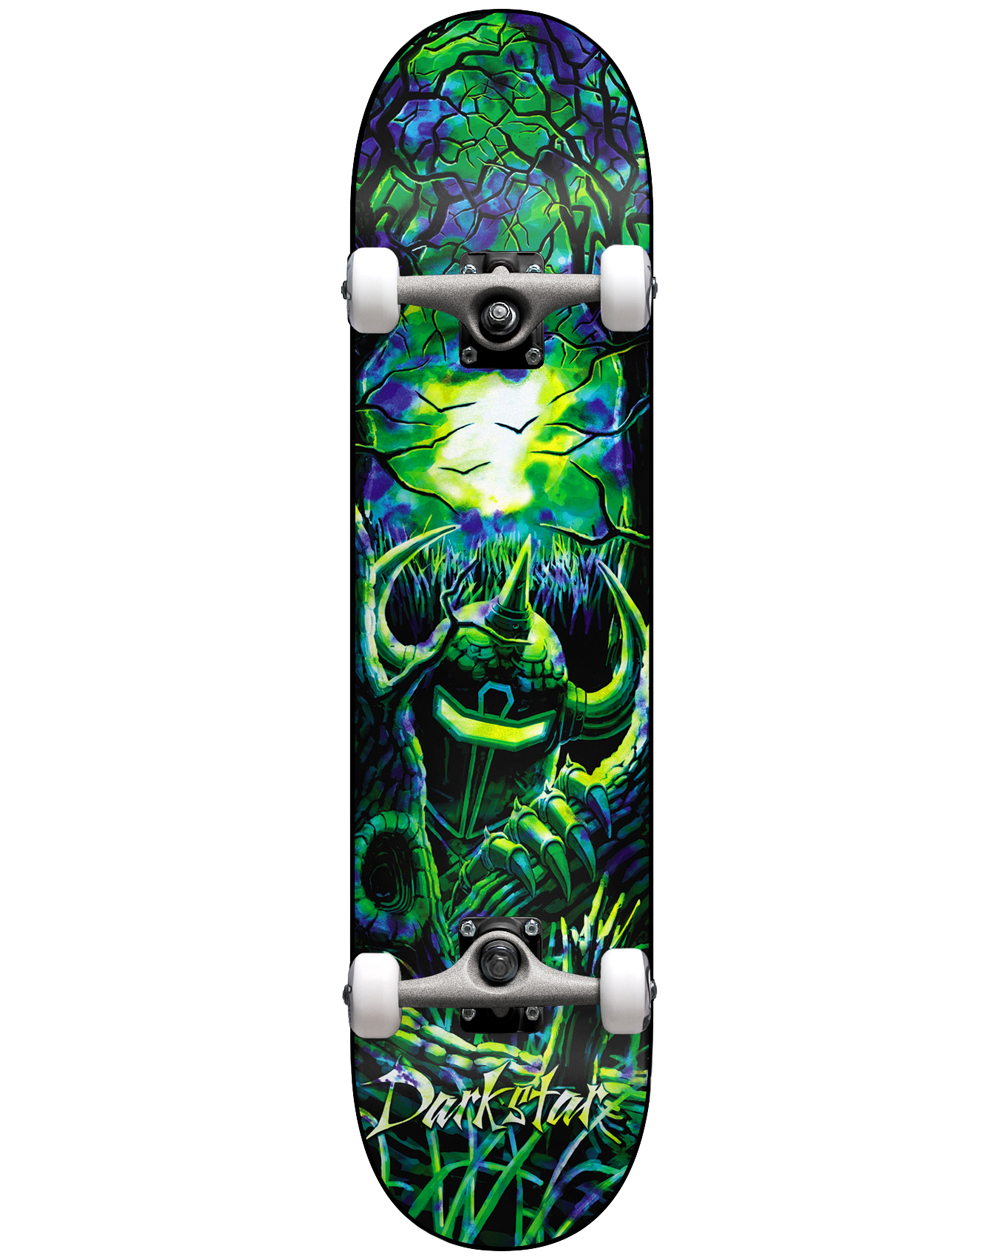 "Darkstar Skateboard Woods 8.125"" Green/Blue"